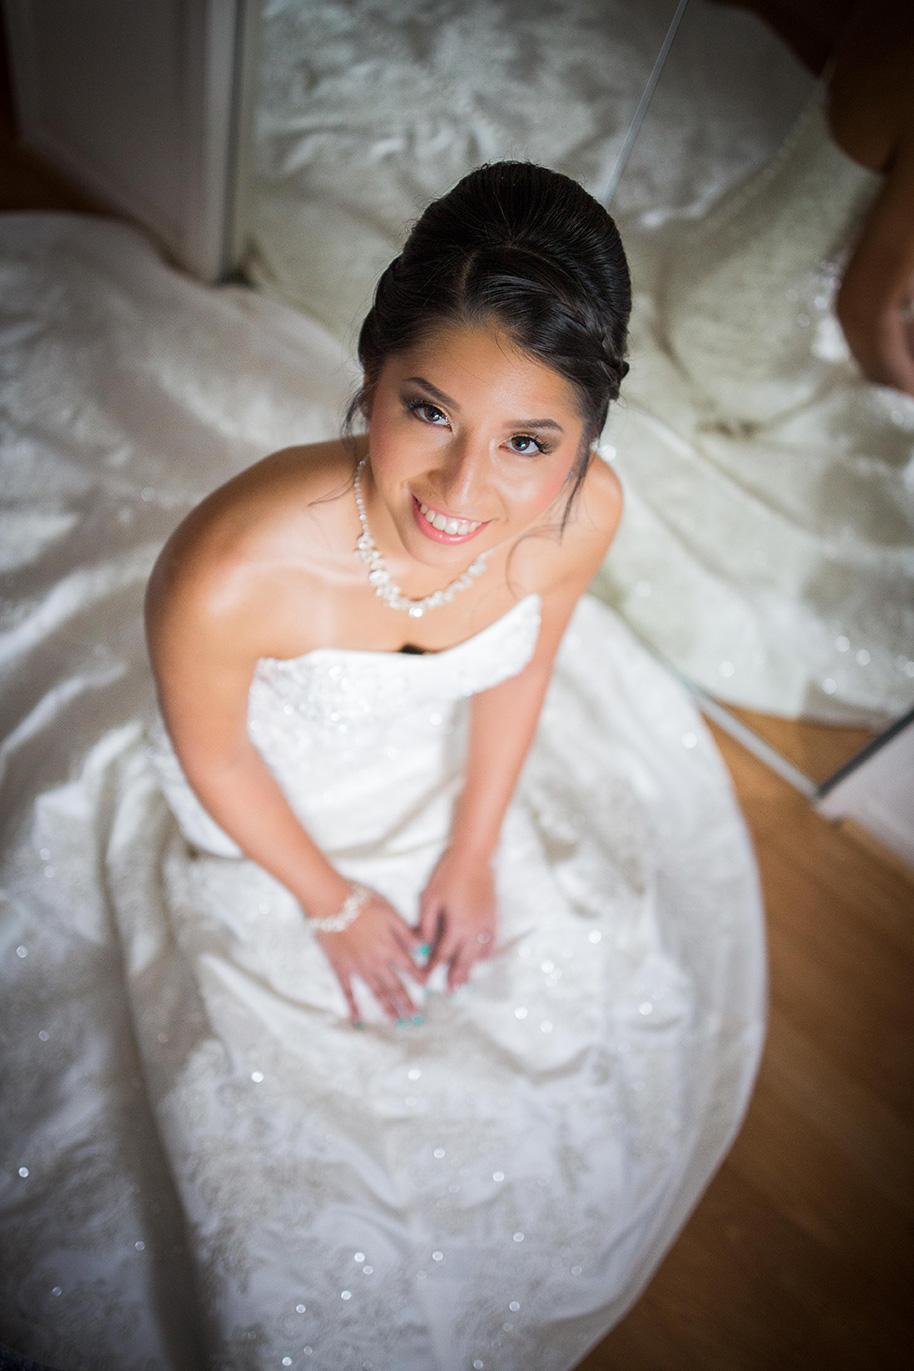 Koolau-Ballrooms-Wedding-041116-4b.jpg